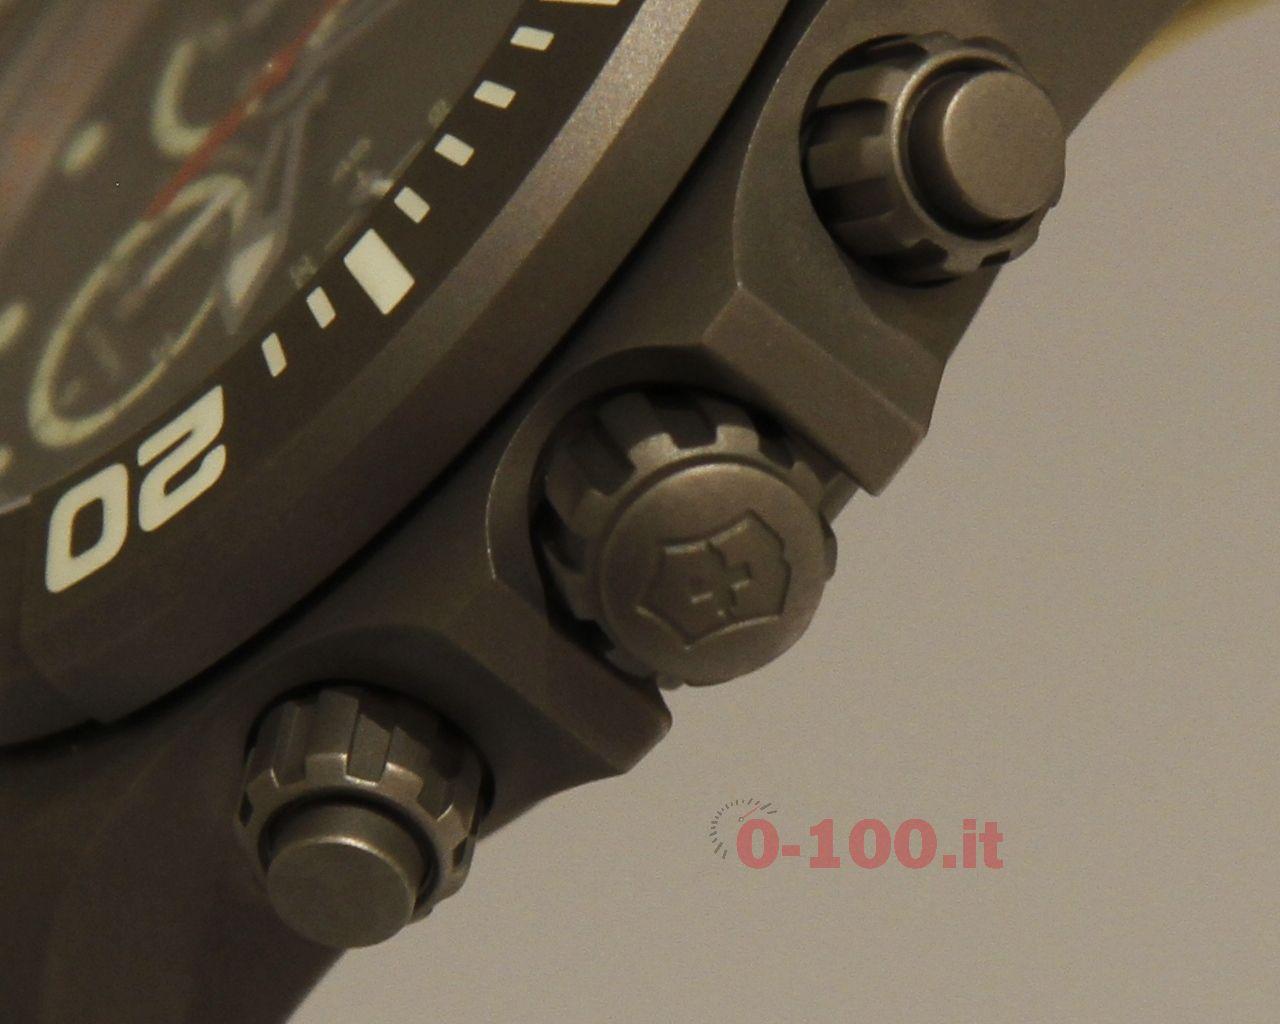 Baselworld2014_Victorinox Swiss Army_Dive_Master_500-0-1006